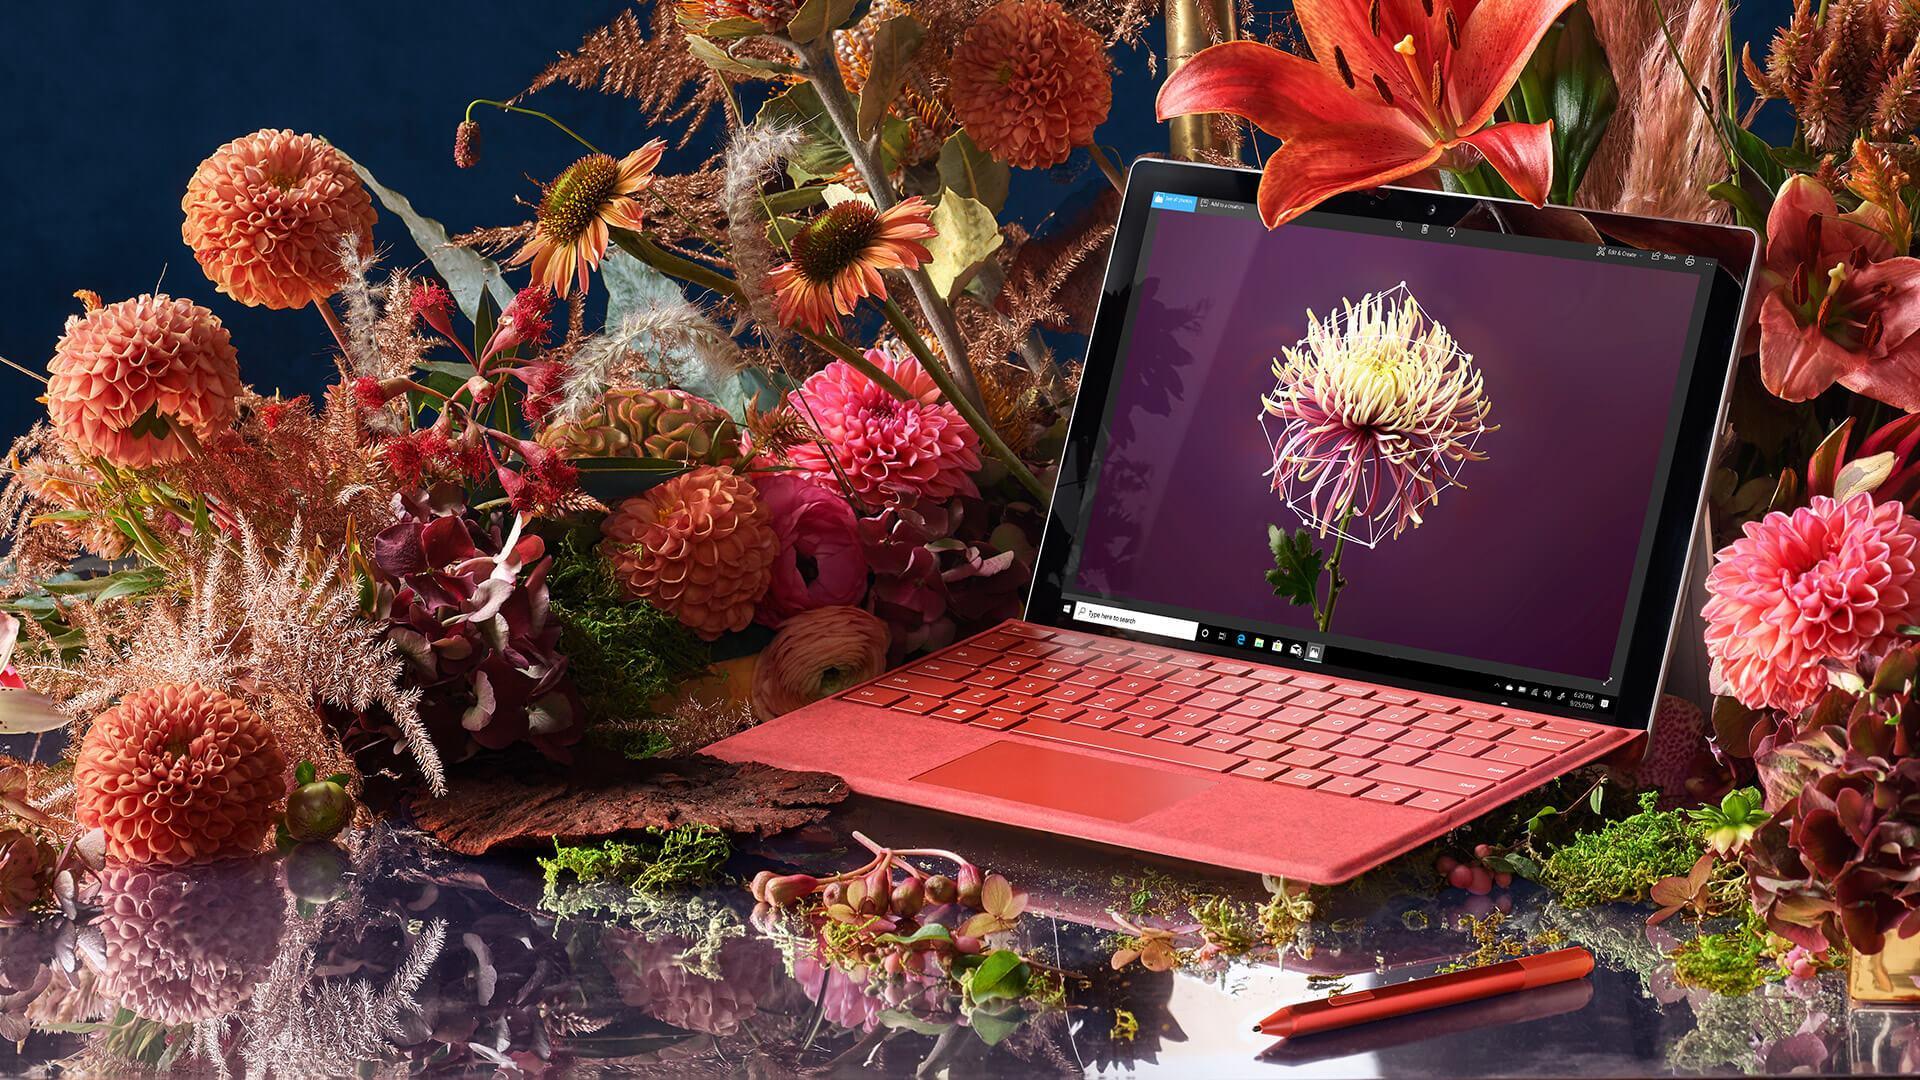 Surface Pro 7 i5 8GB 128GB